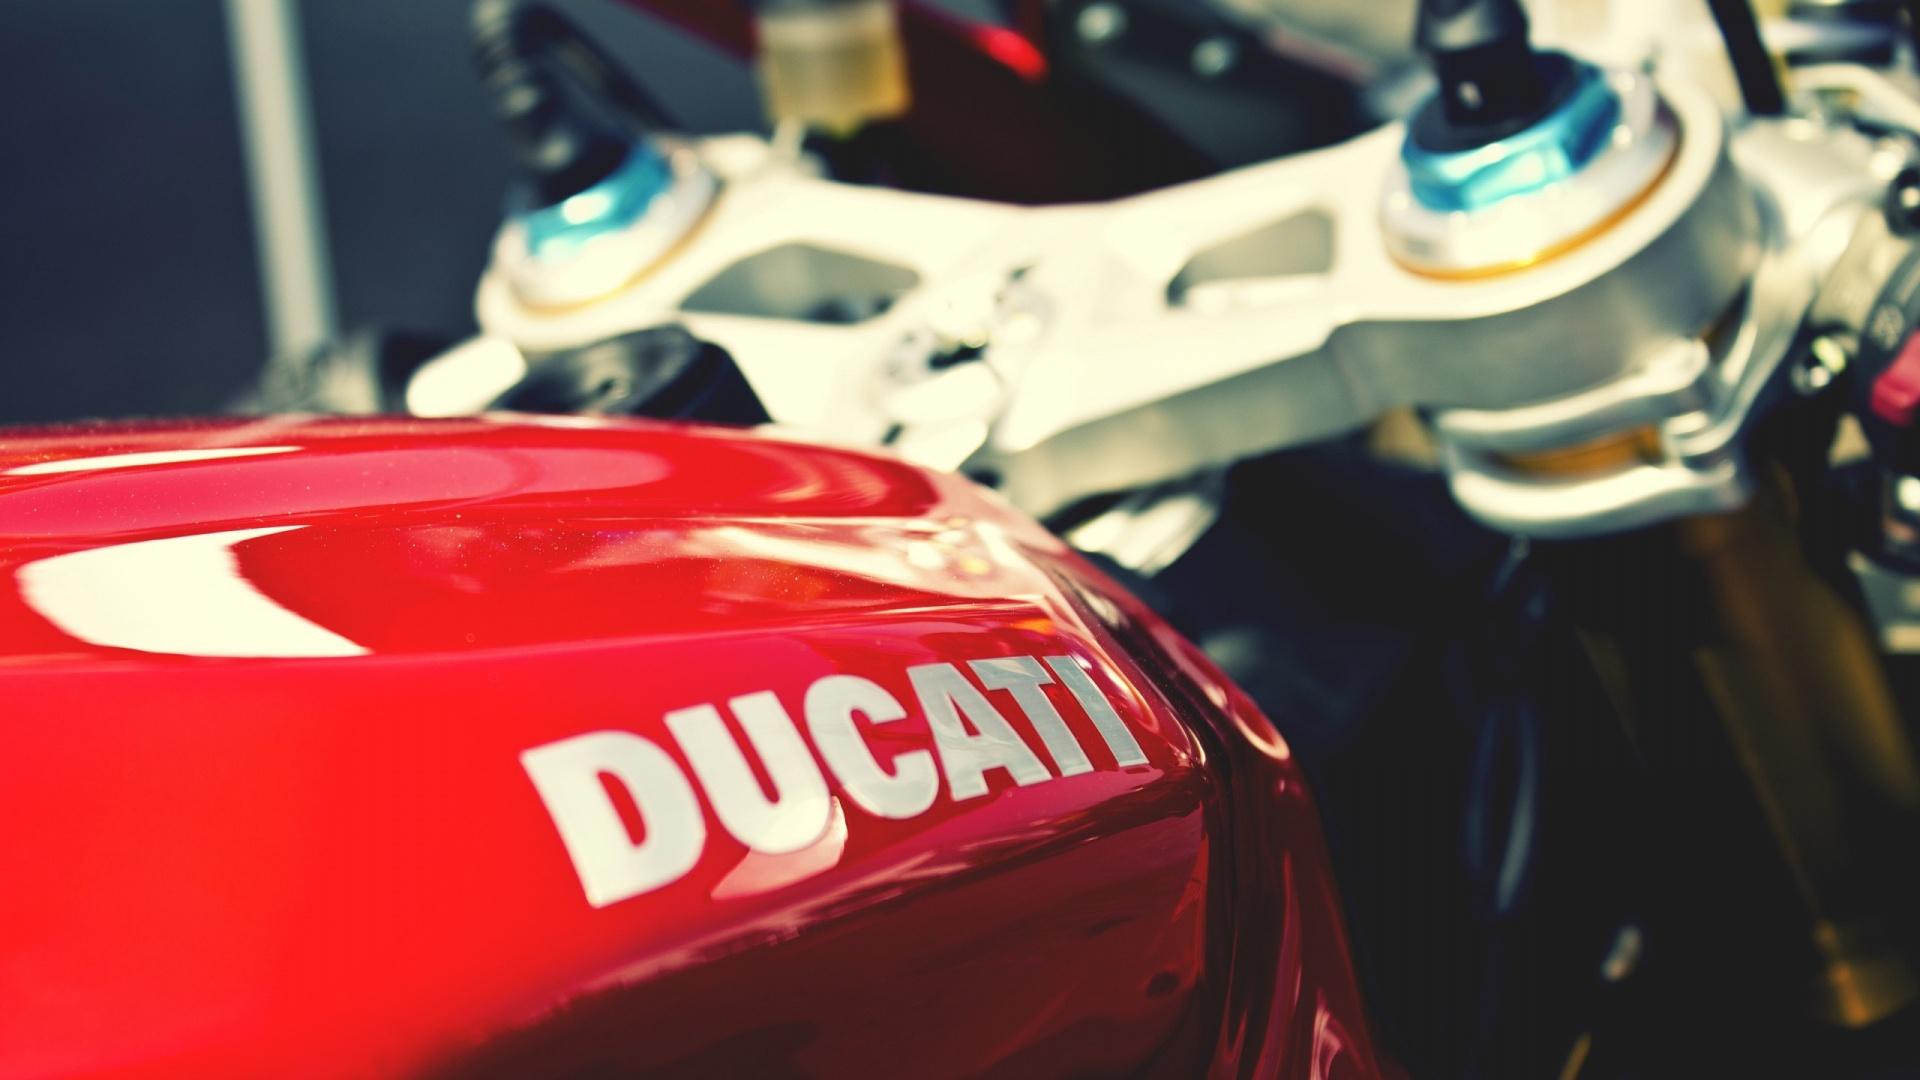 Ducati Logo Wallpaper Iphone 5 Ducati Iphone hd Wallpapers 1920x1080